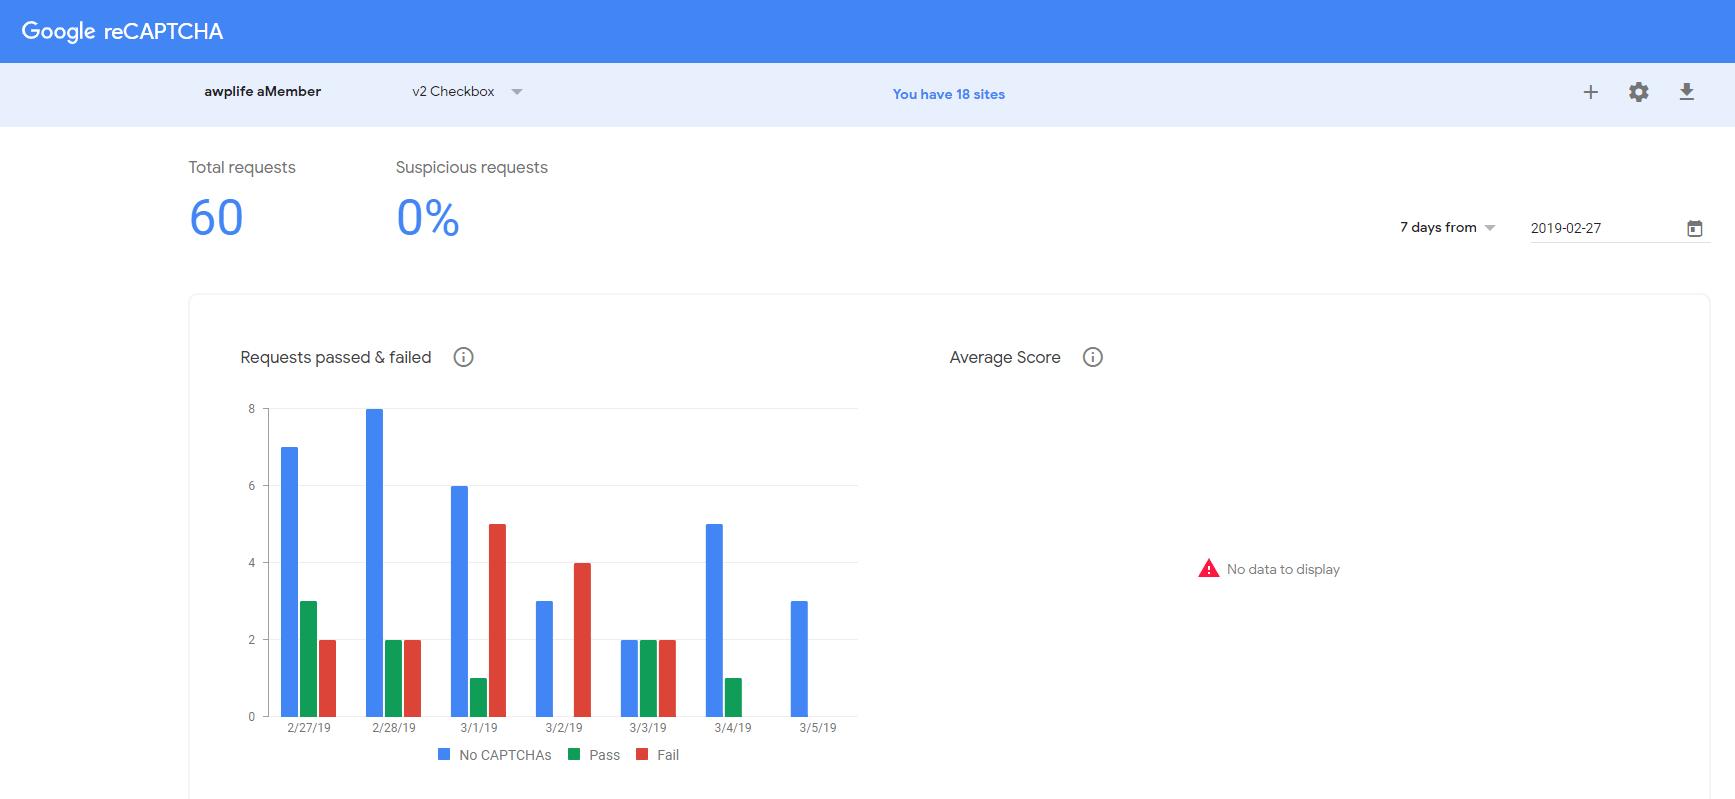 Google reCaptcha Admin Console Dashboard - A WP Life